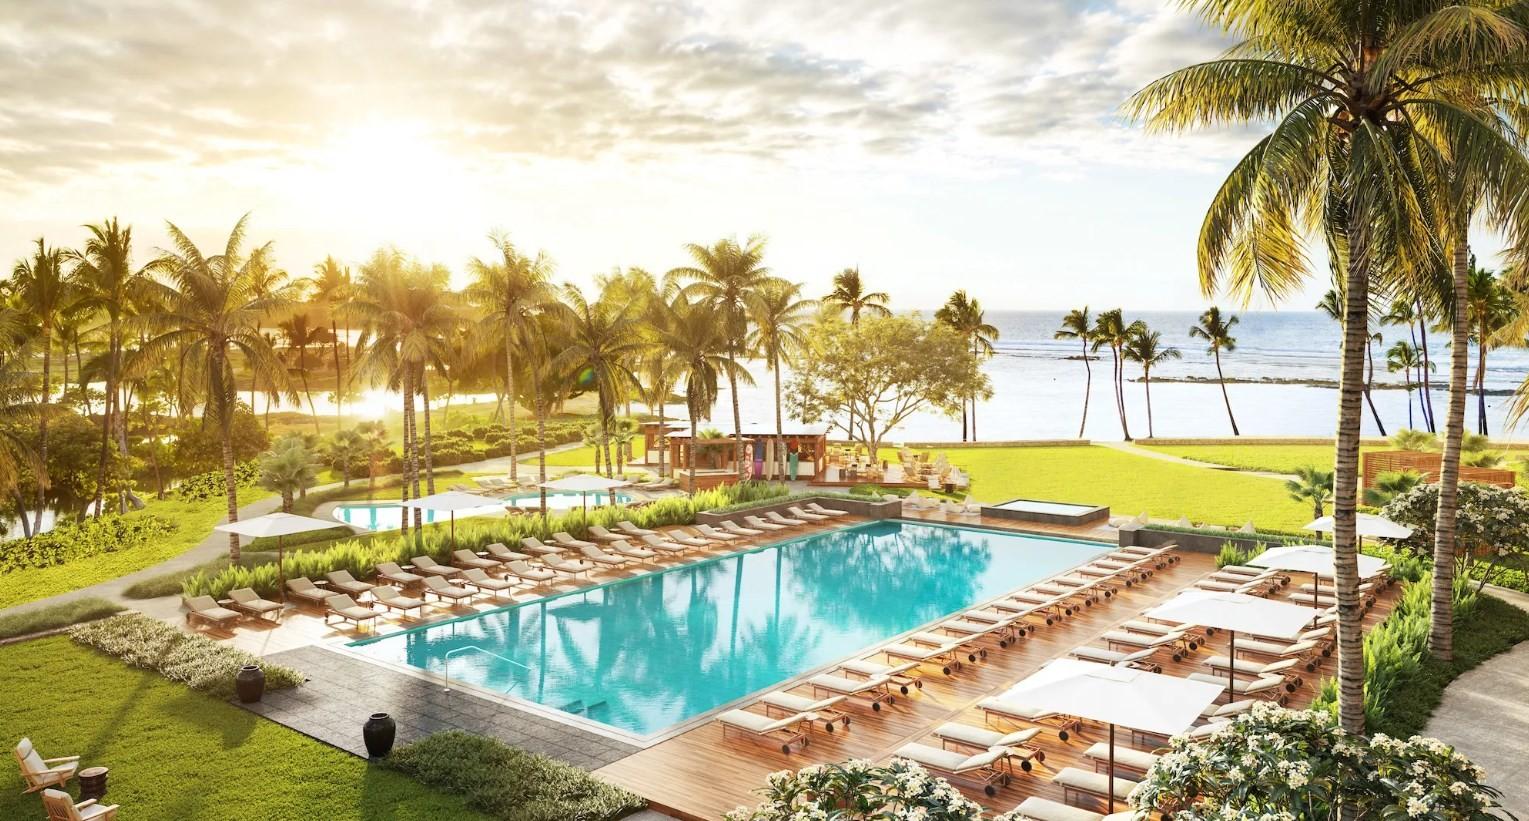 news-main-auberge-resorts-collection-opens-mauna-lani-resort-in-hawaii.1579258821.jpg